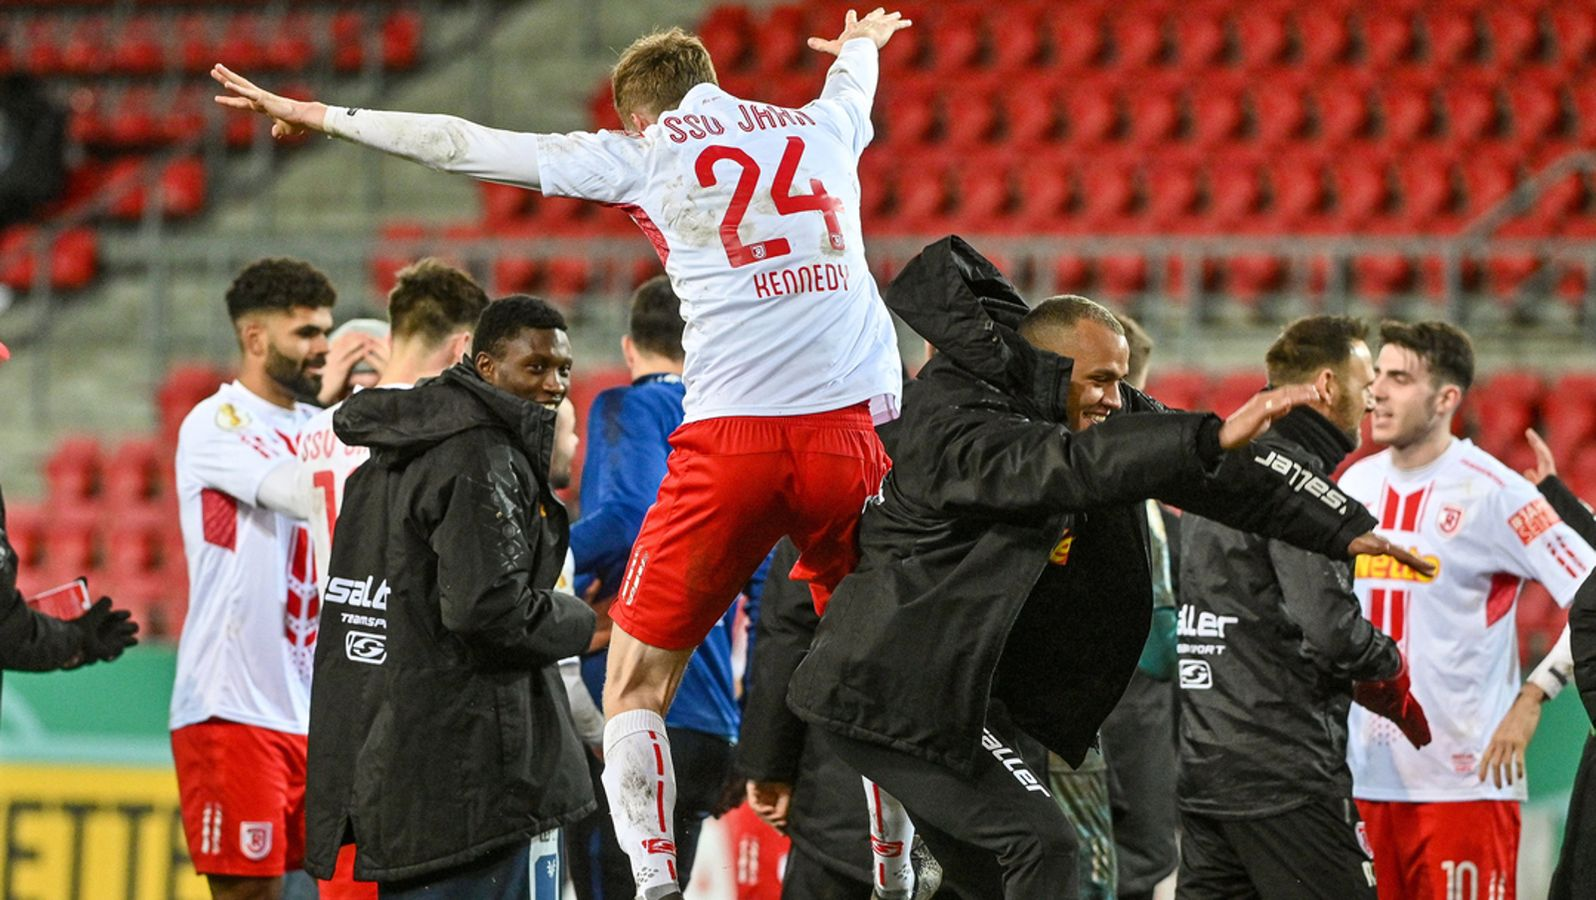 Pokalerfolg bringt Jahn Regensburg Millioneneinnahme - BR24